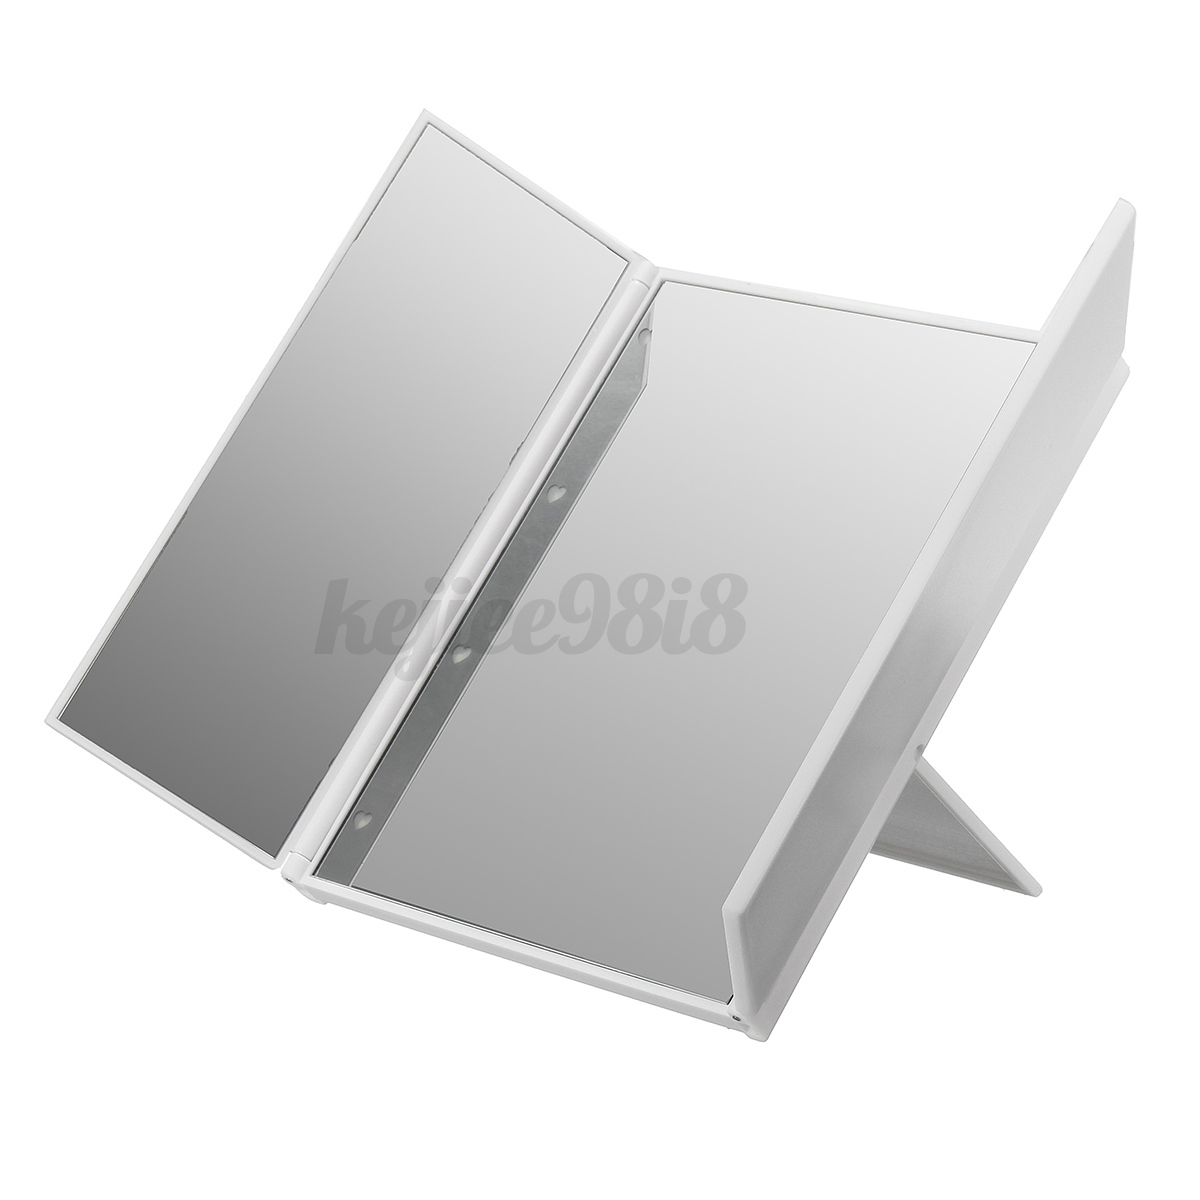 Foldable-8-LED-Light-Illuminated-Make-Up-Cosmetic-Tabletop-Beauty-Vanity-Mirror